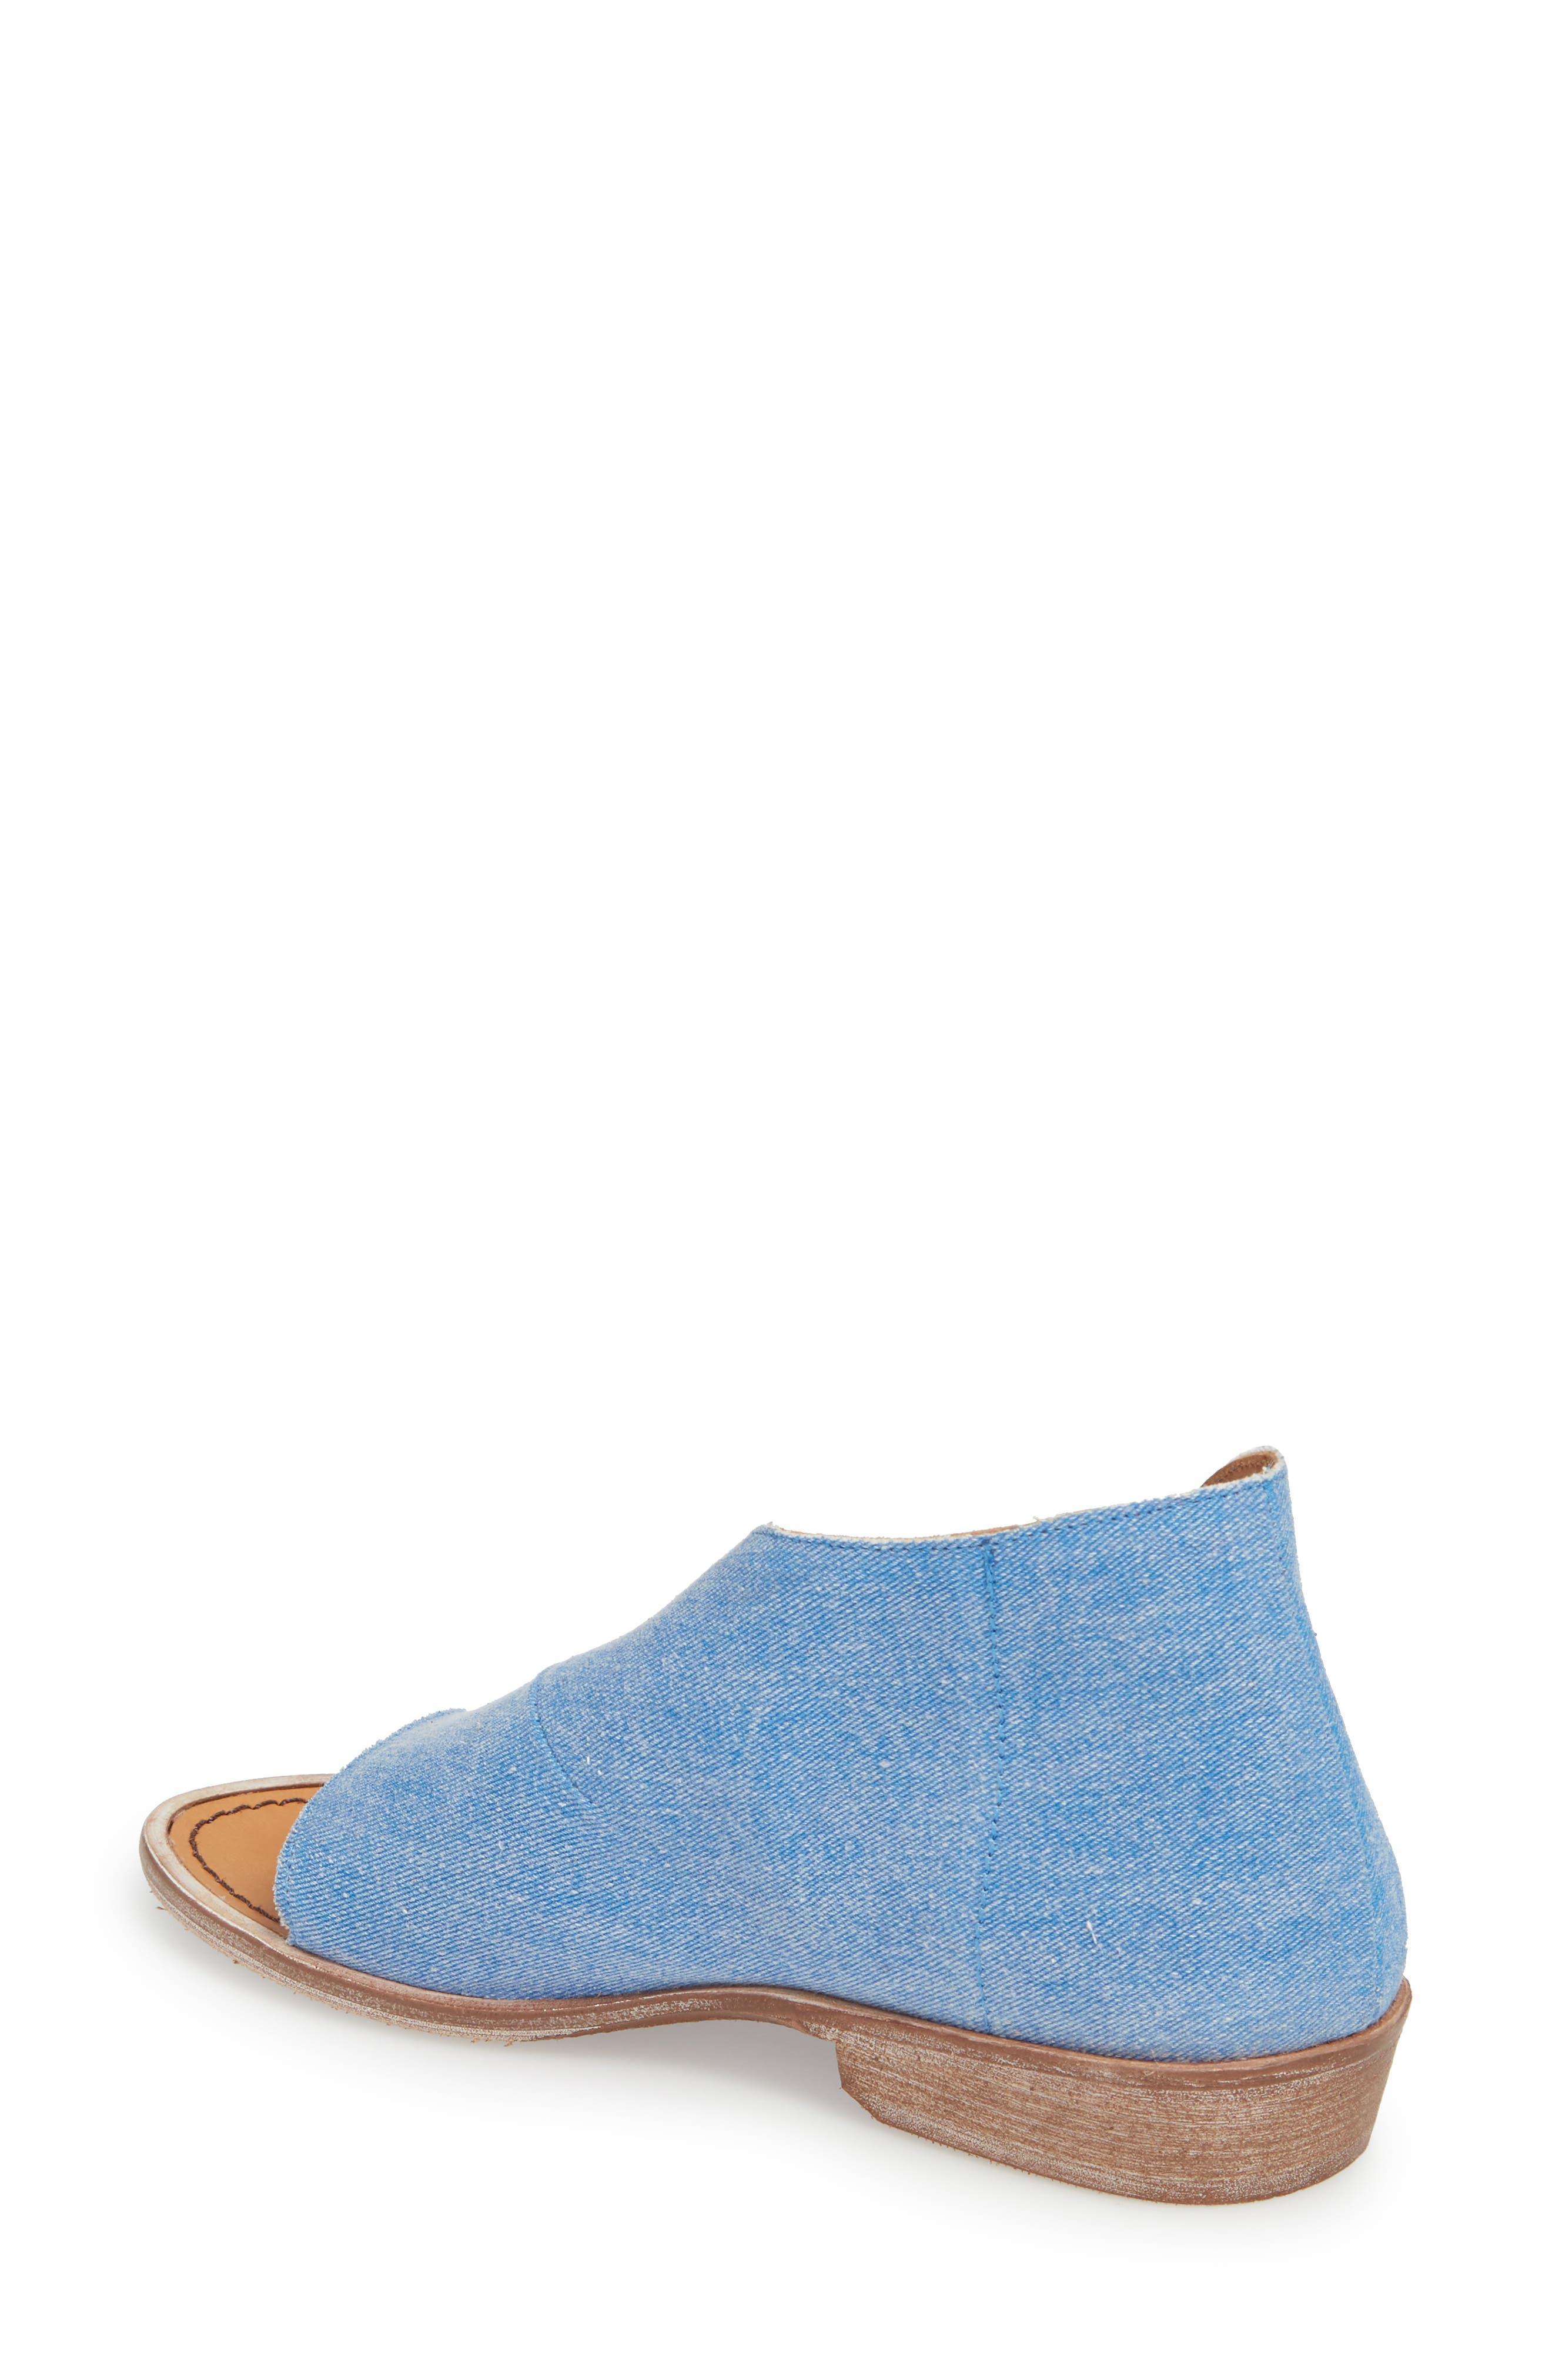 'Mont Blanc' Asymmetrical Sandal,                             Alternate thumbnail 19, color,